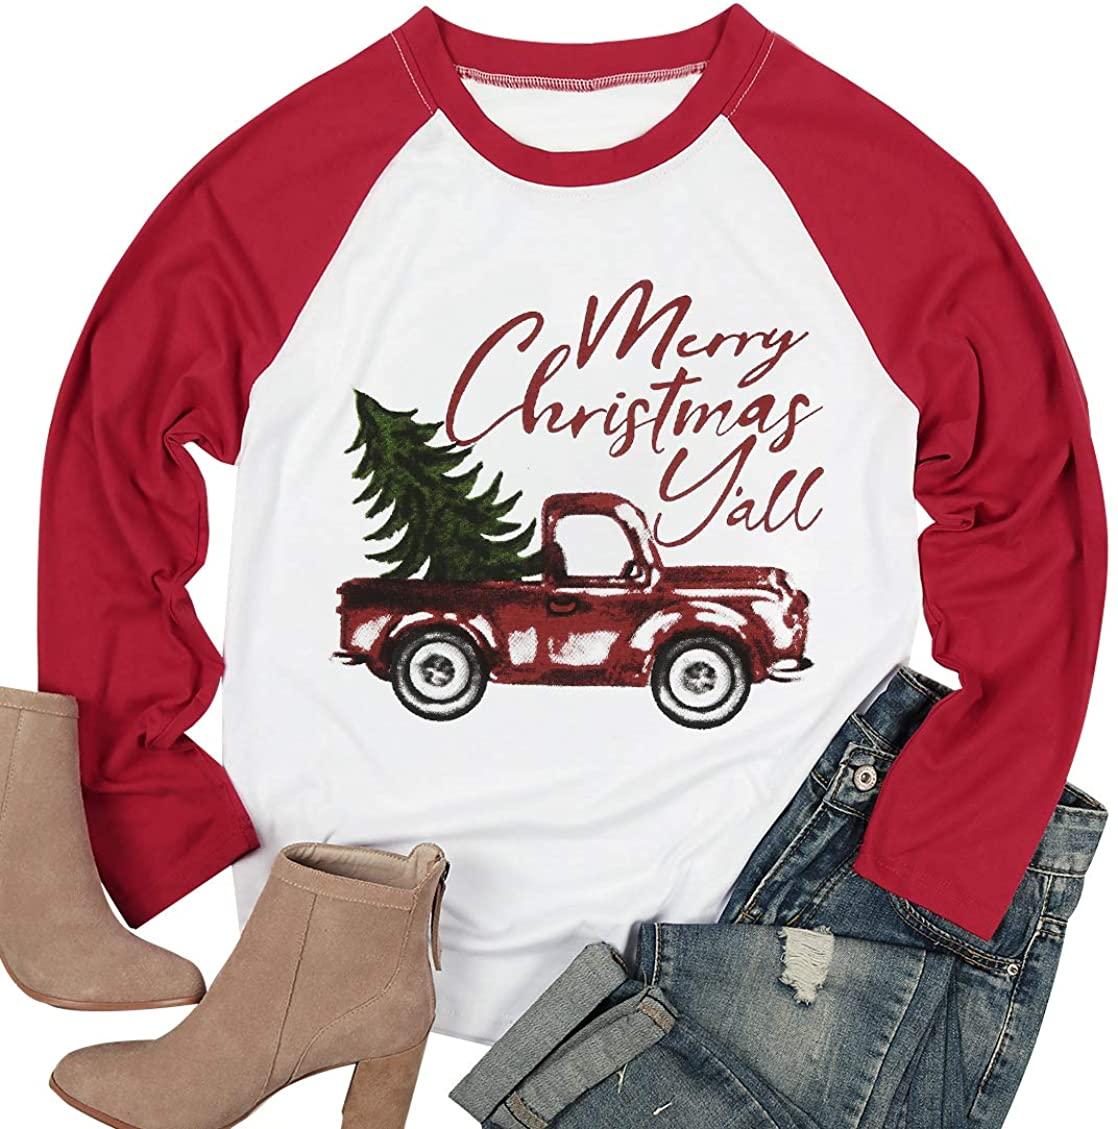 Plus Size Merry Christmas Y'all Baseball Shirt Women Xmas Truck Tree Graphic Tees 3/4 Sleeve Raglan Tops